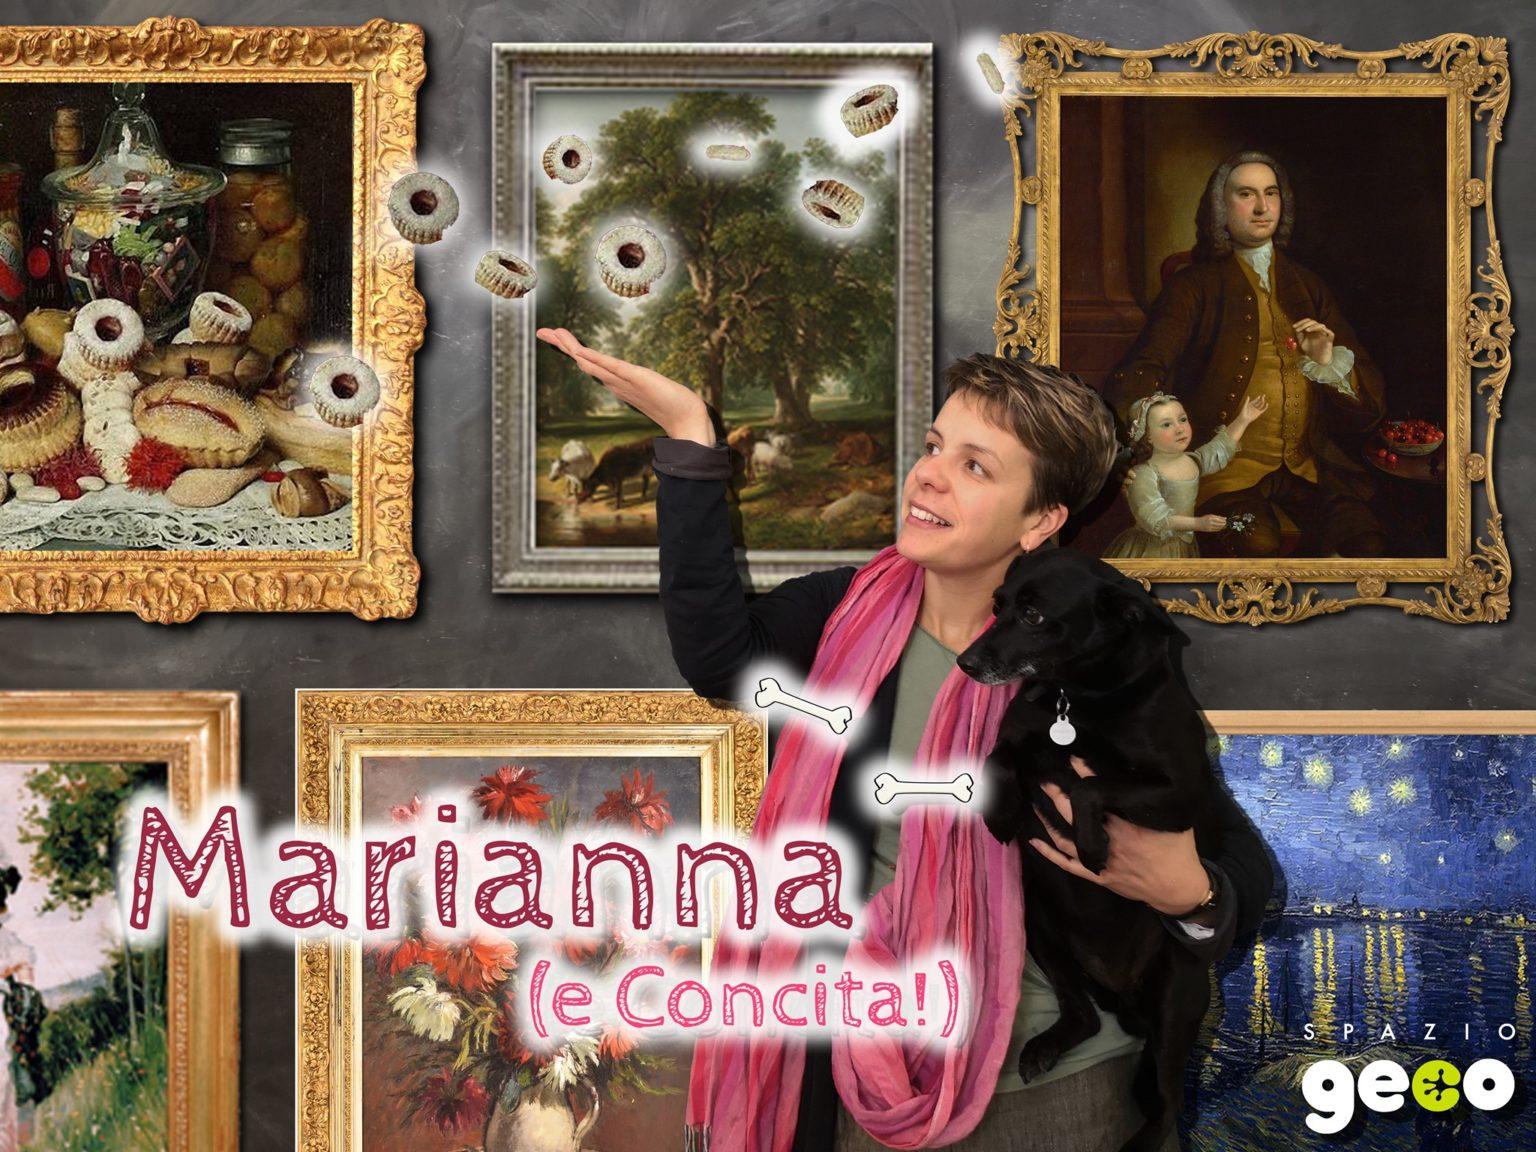 Marianna Belvedere Spazio Geco